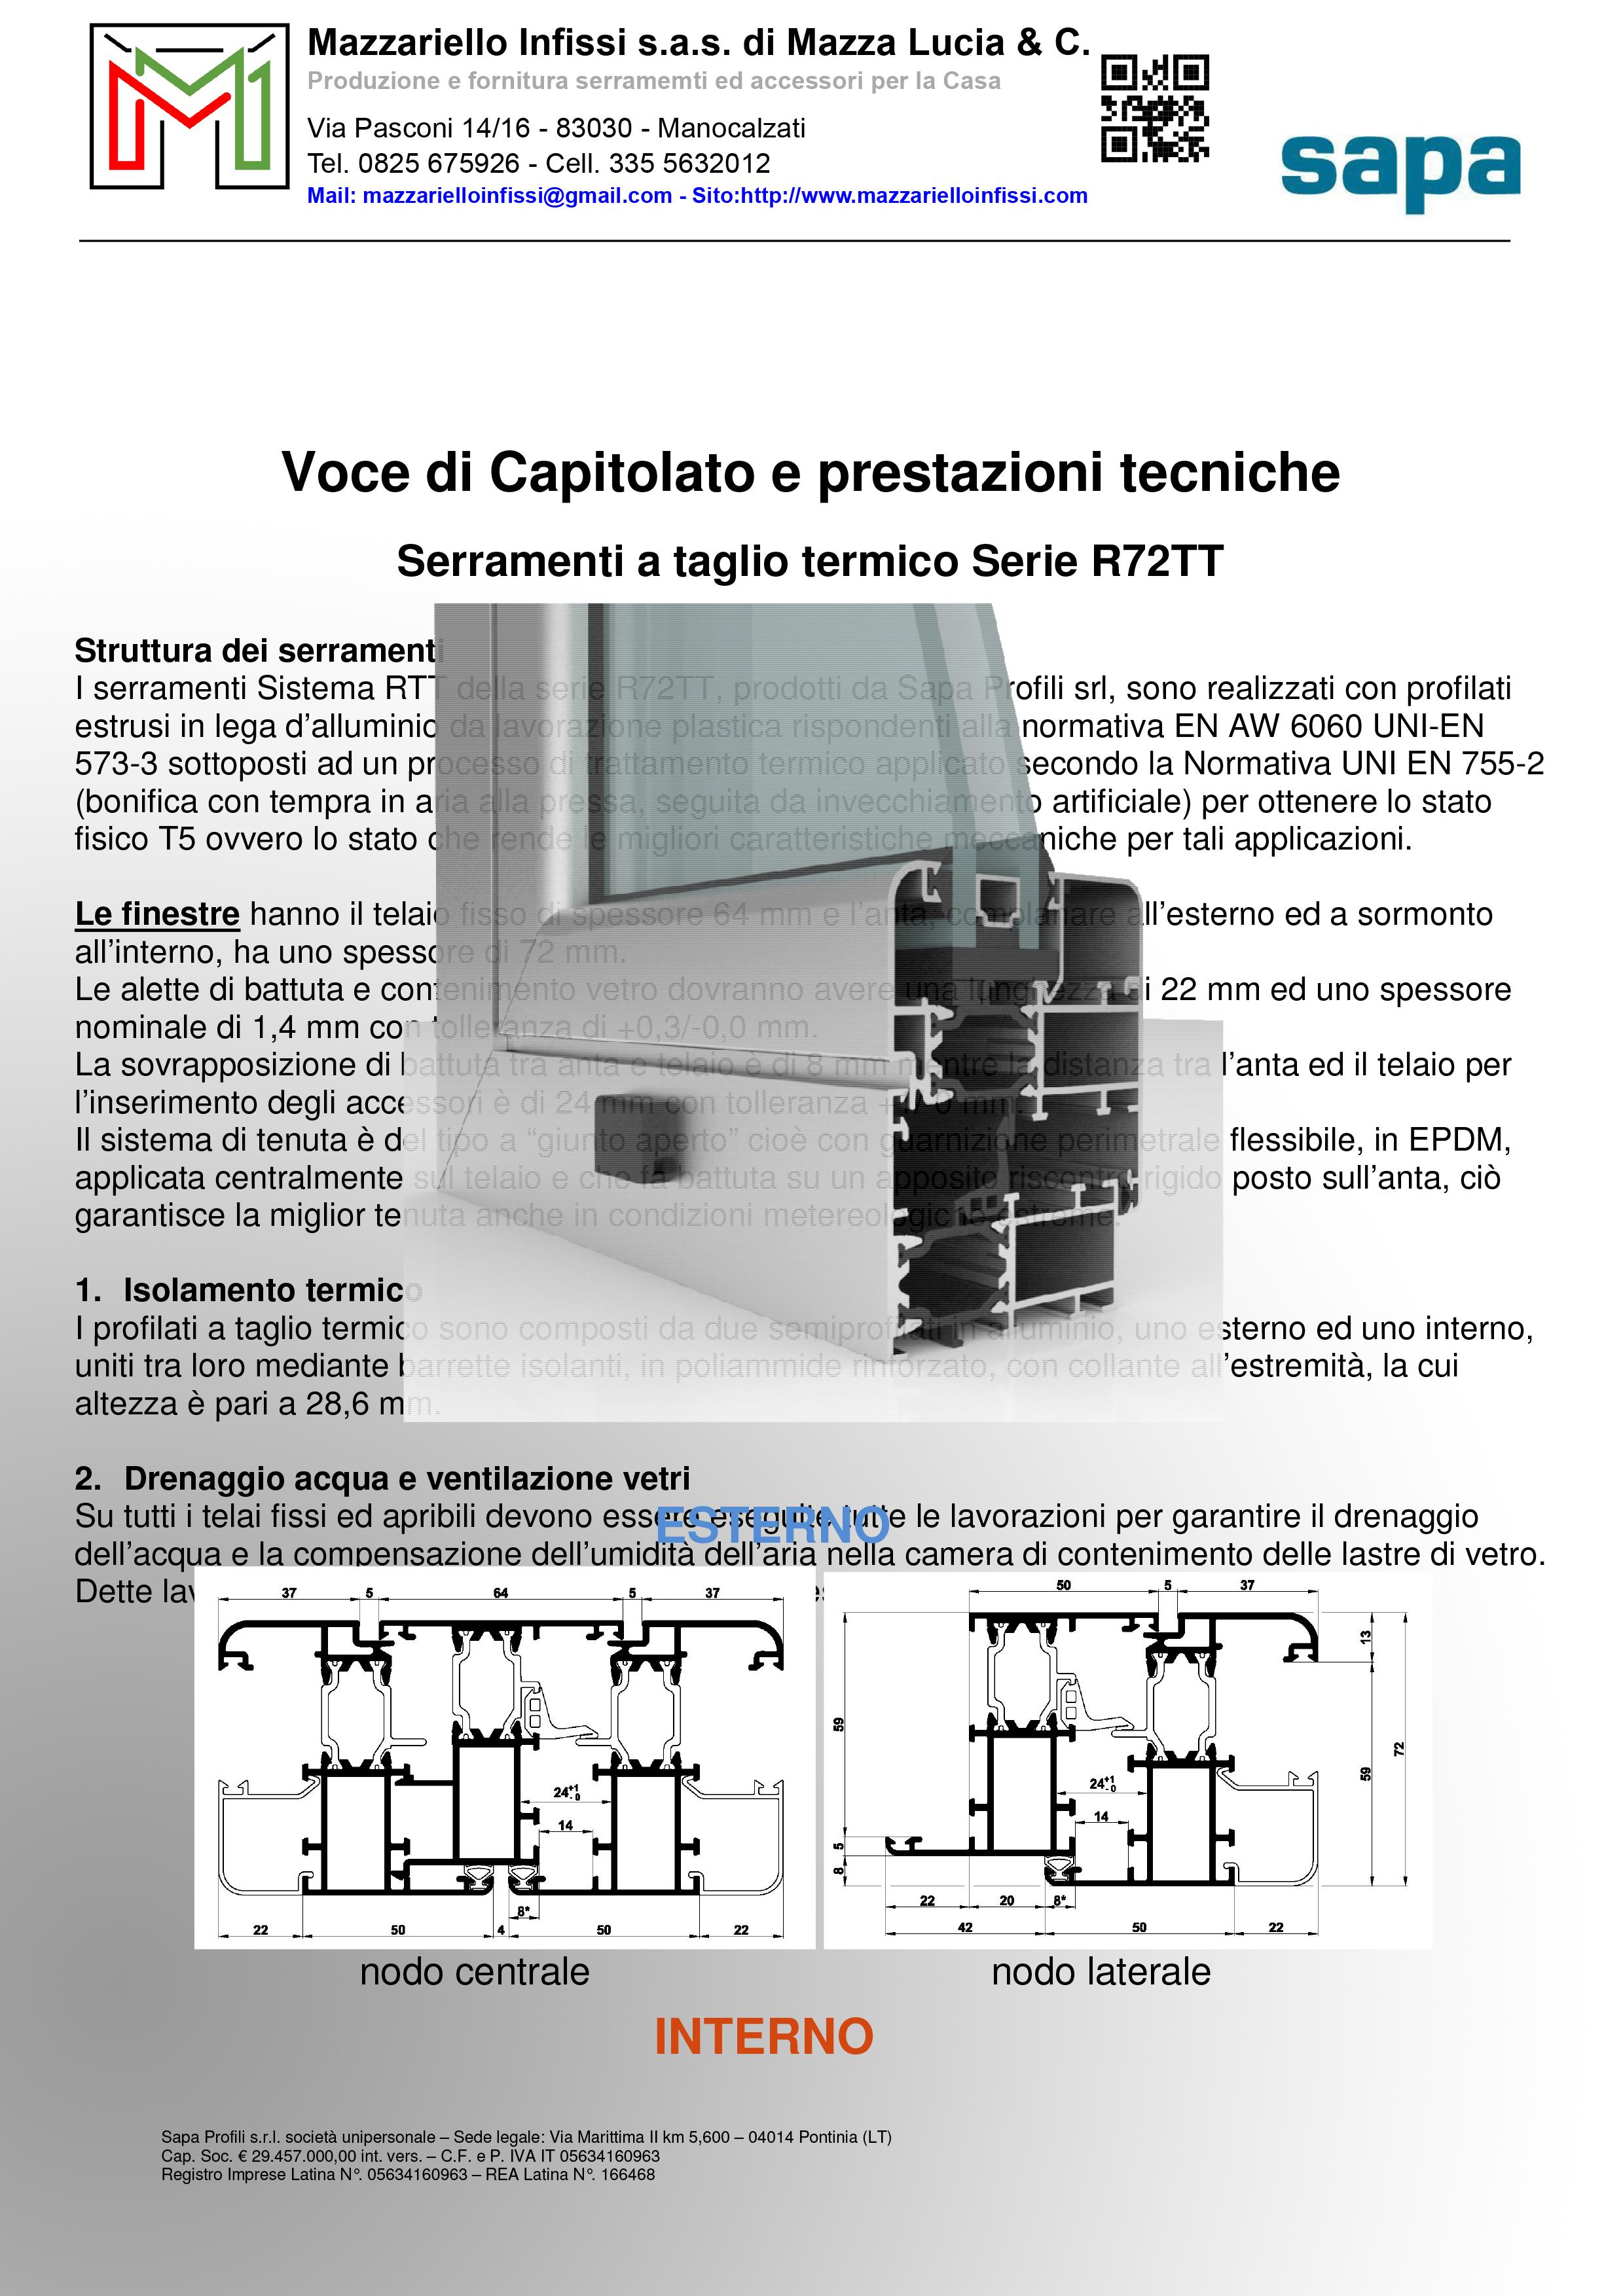 Capitolato-R72TT-Mazza